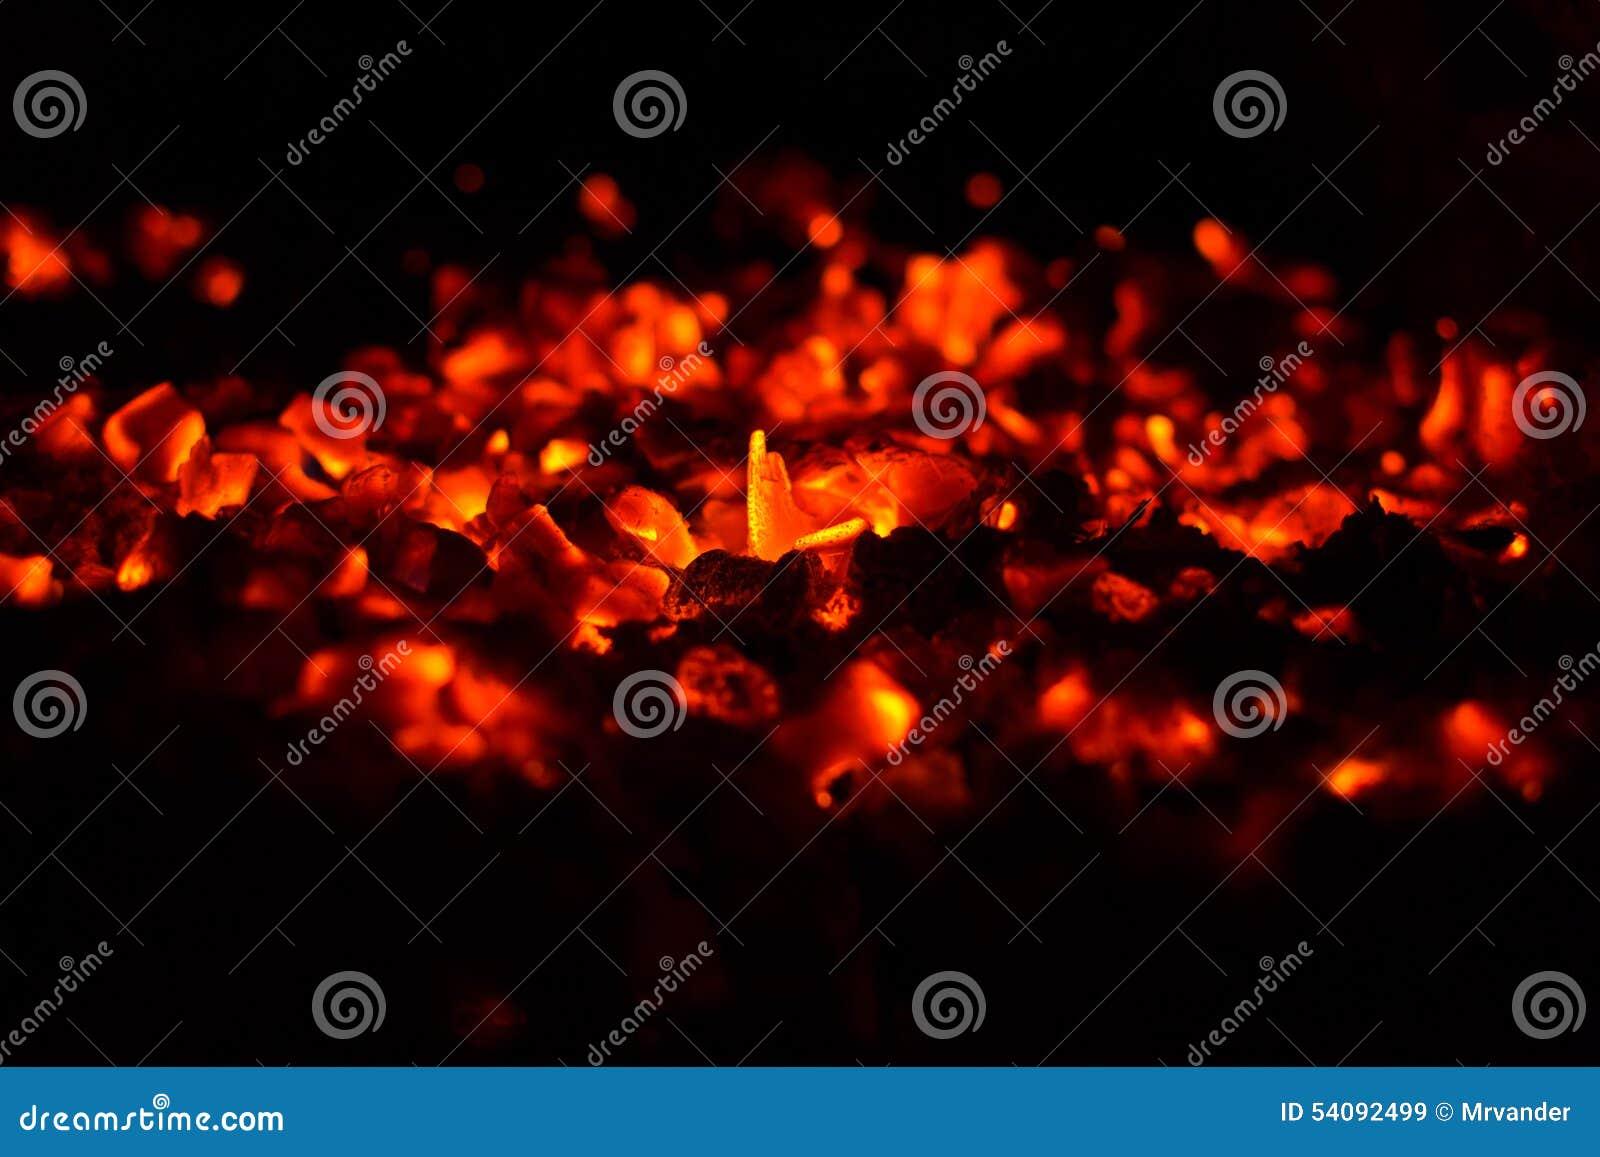 Charbons brûlants